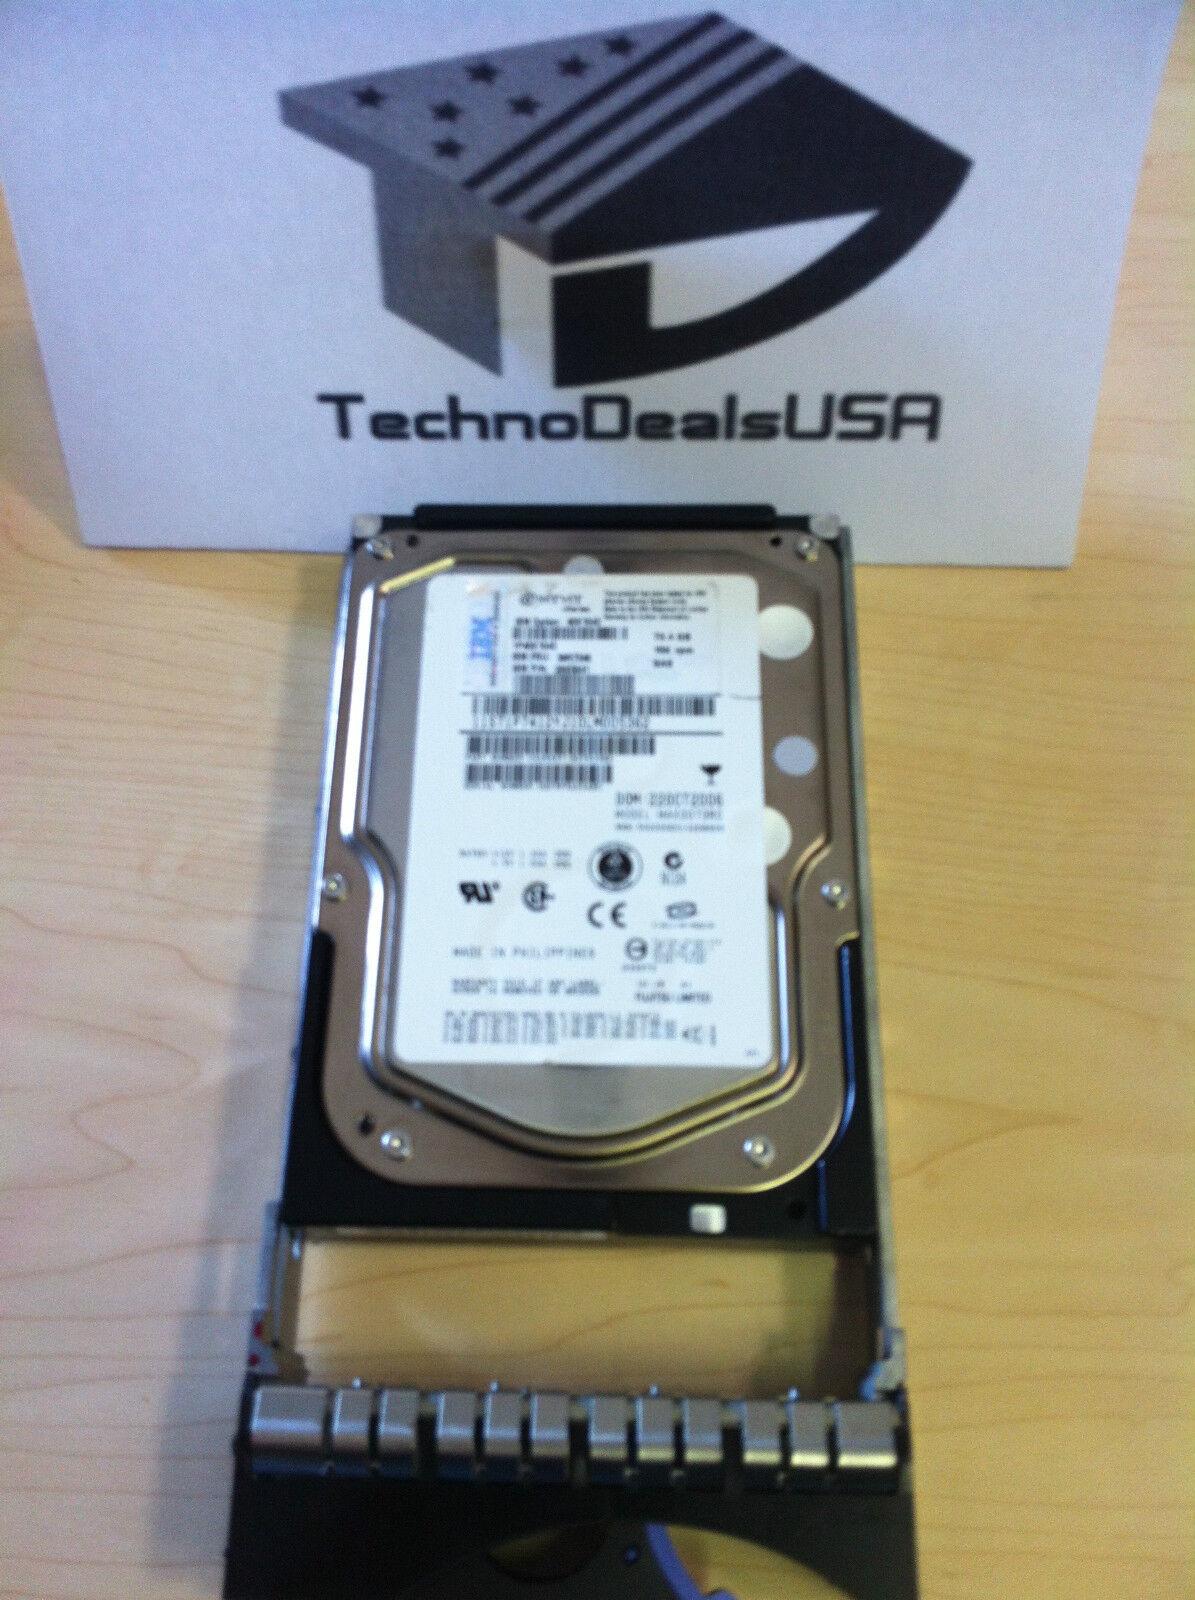 73P8023,73P8022 26K5203 IBM 2Gbps FC 146.8 GB 15K Hot-Swap HDD